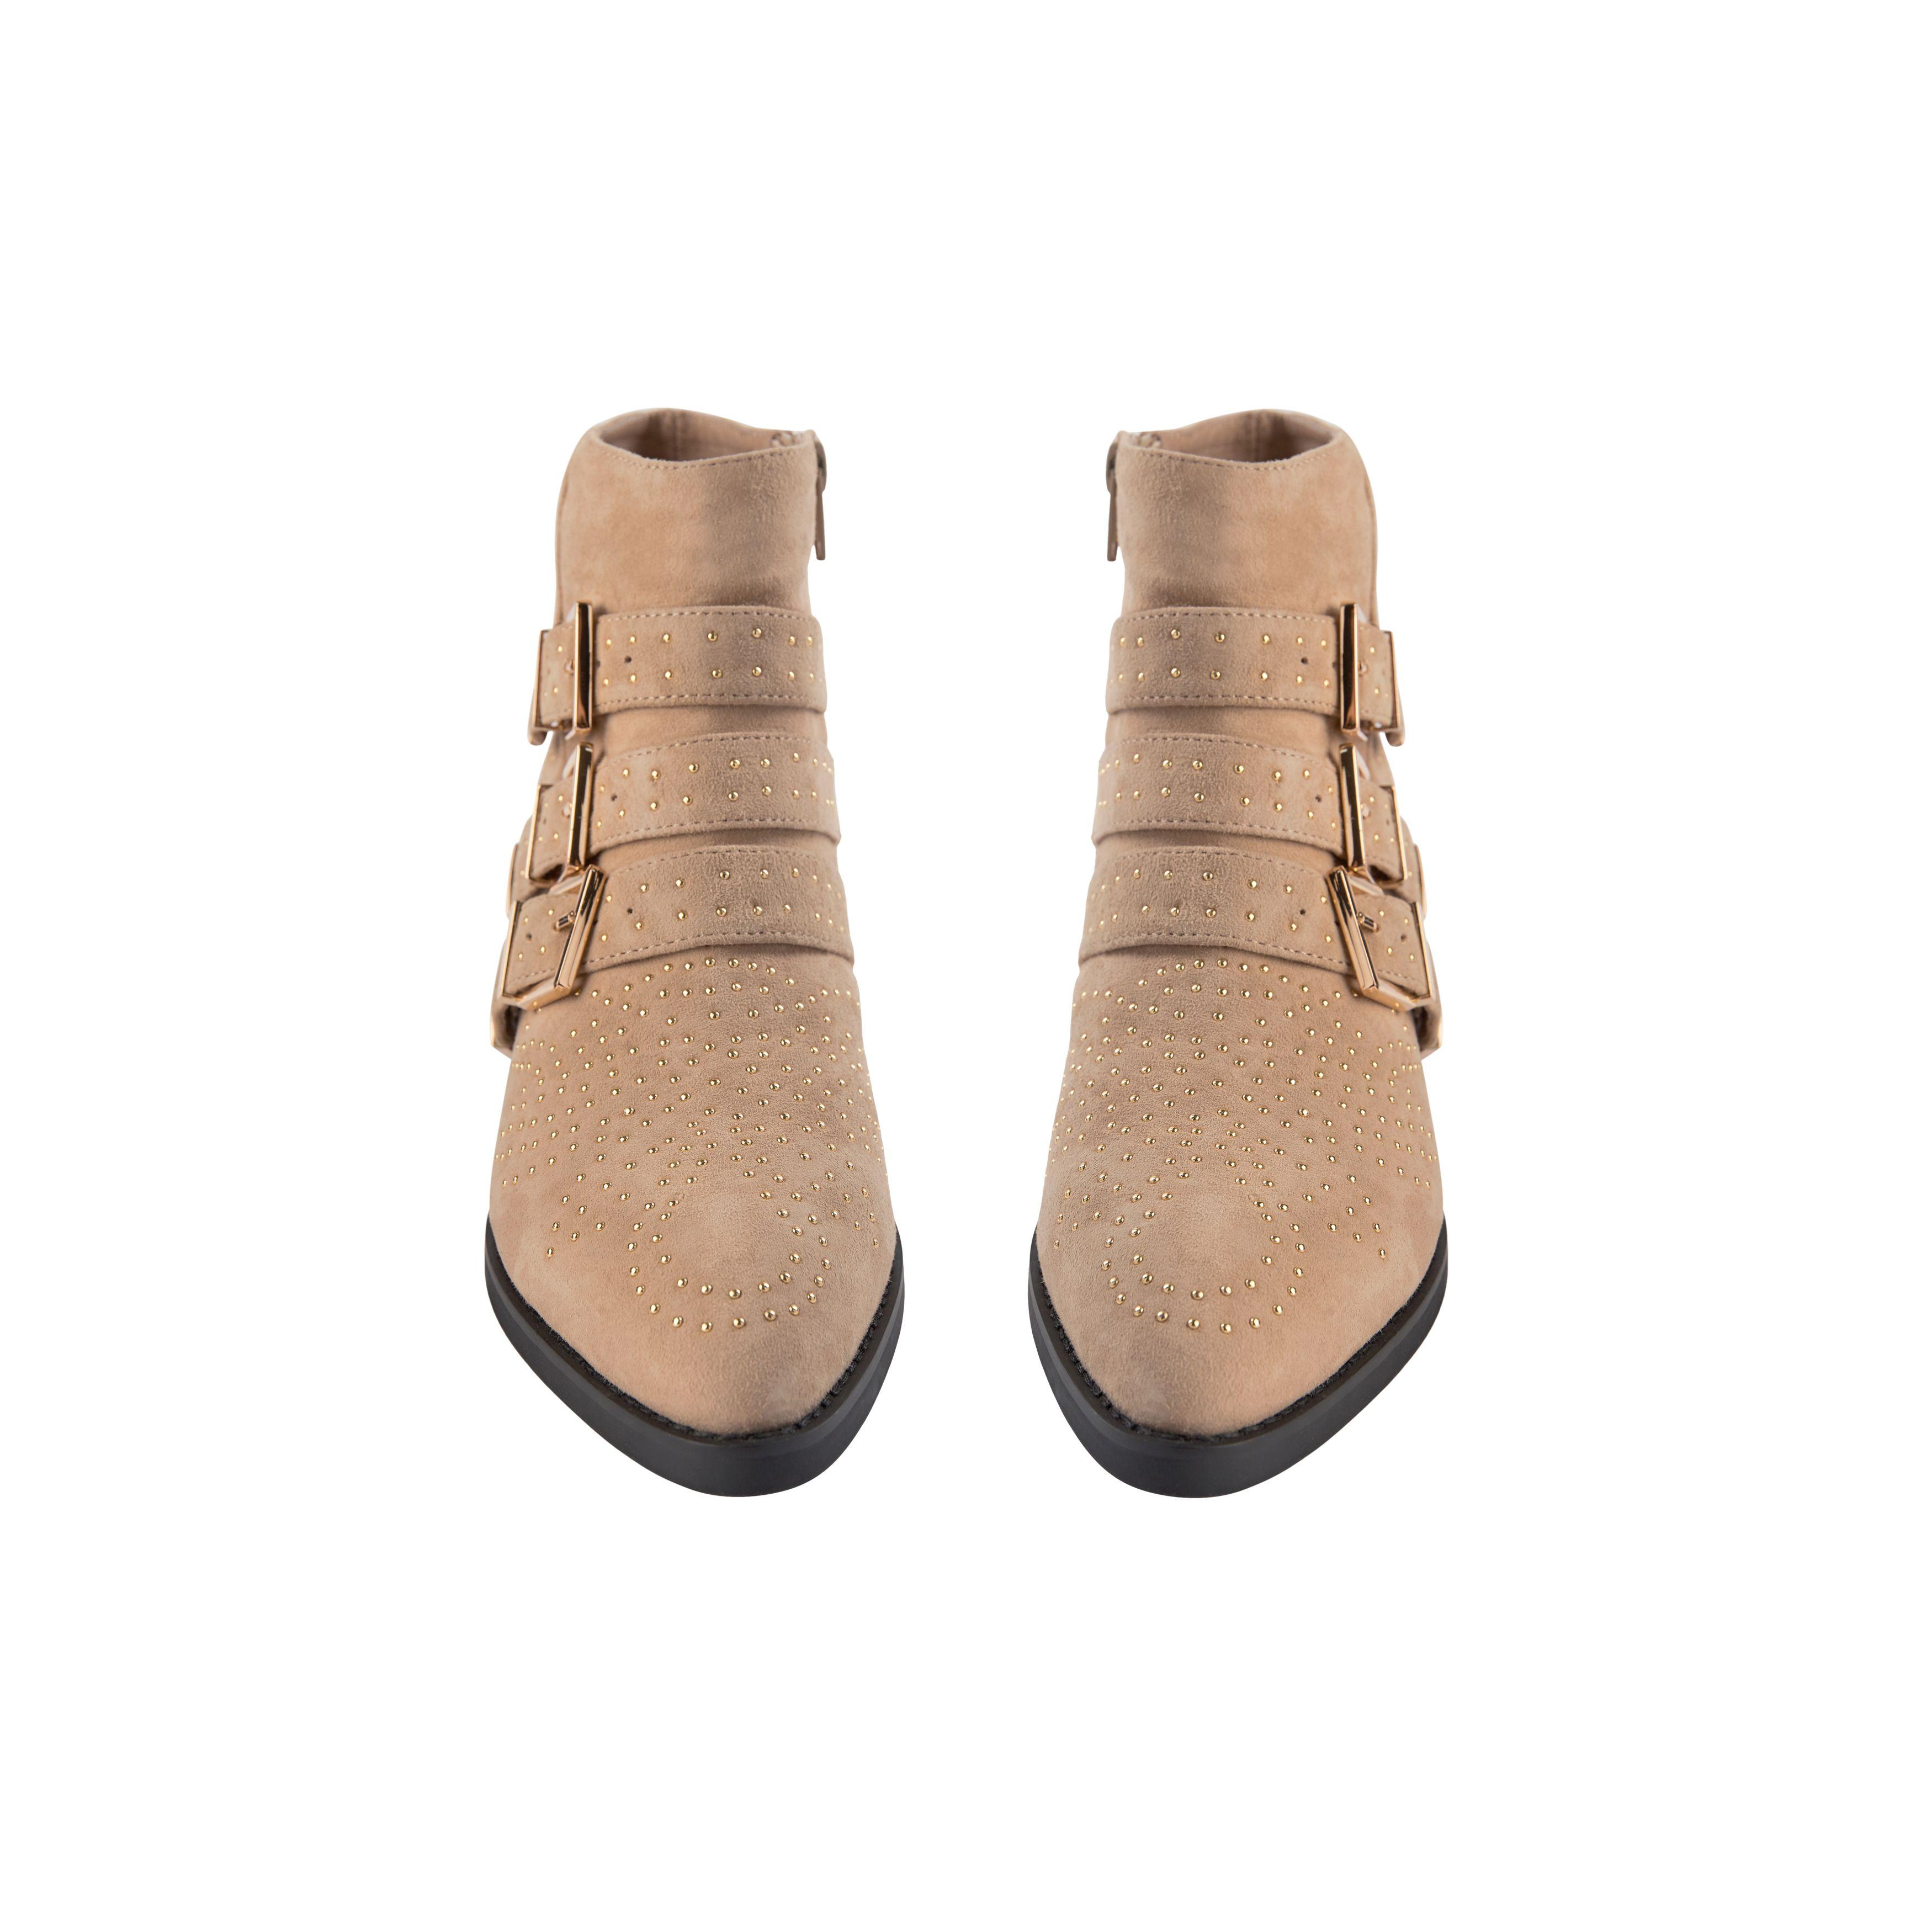 Sofie Schnoor S211707 støvle, sand, 38